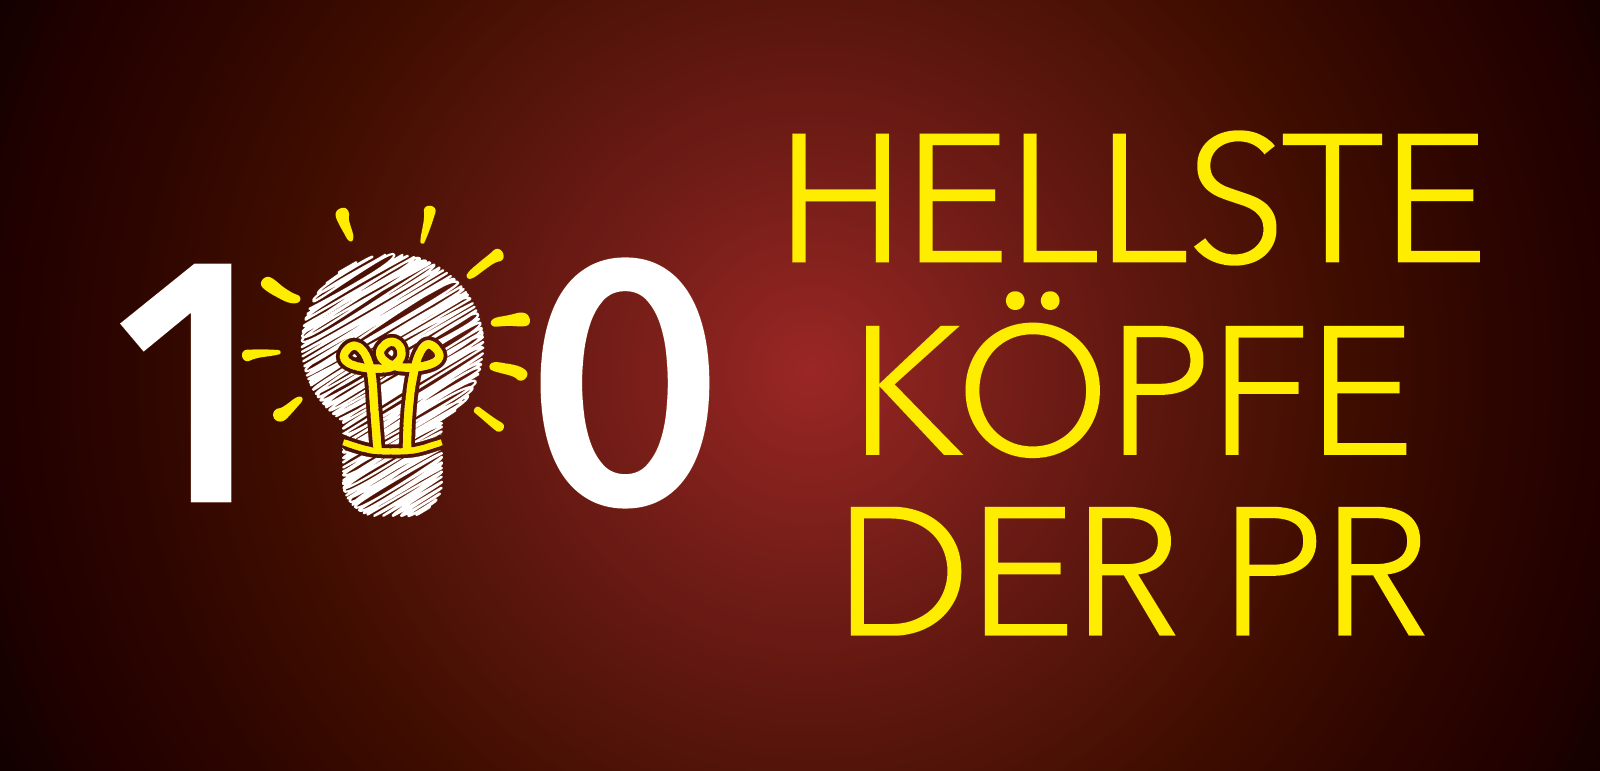 Helle Koepfe 100 Faktenkontor Rolke Forthmann